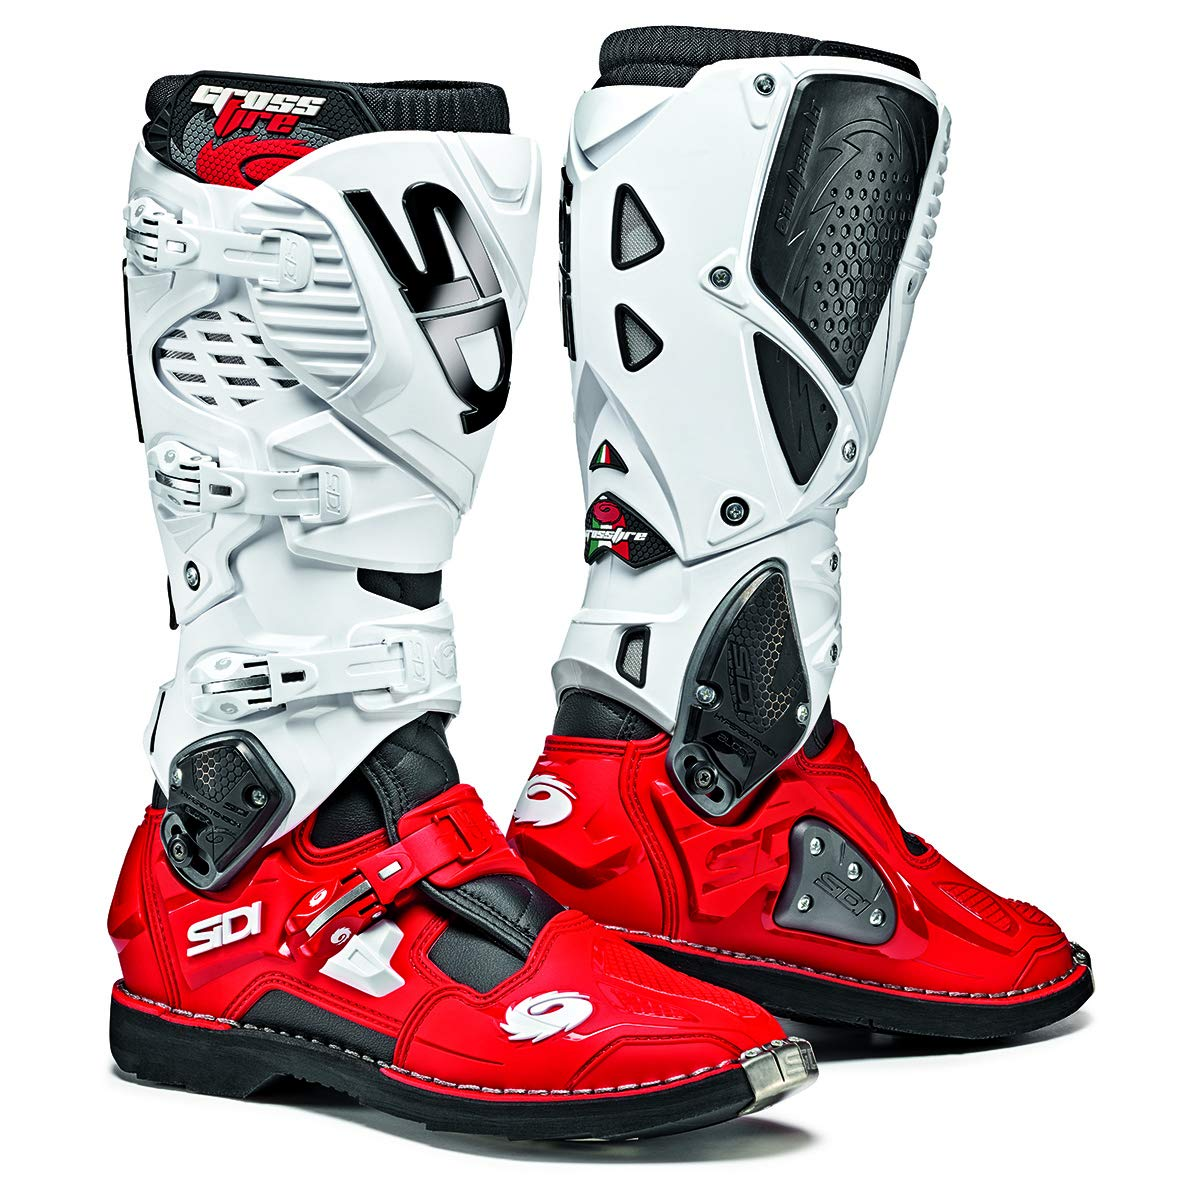 Black // Red // White - US11 // EU45 Sidi Crossfrie 3 TA Dirt Boot